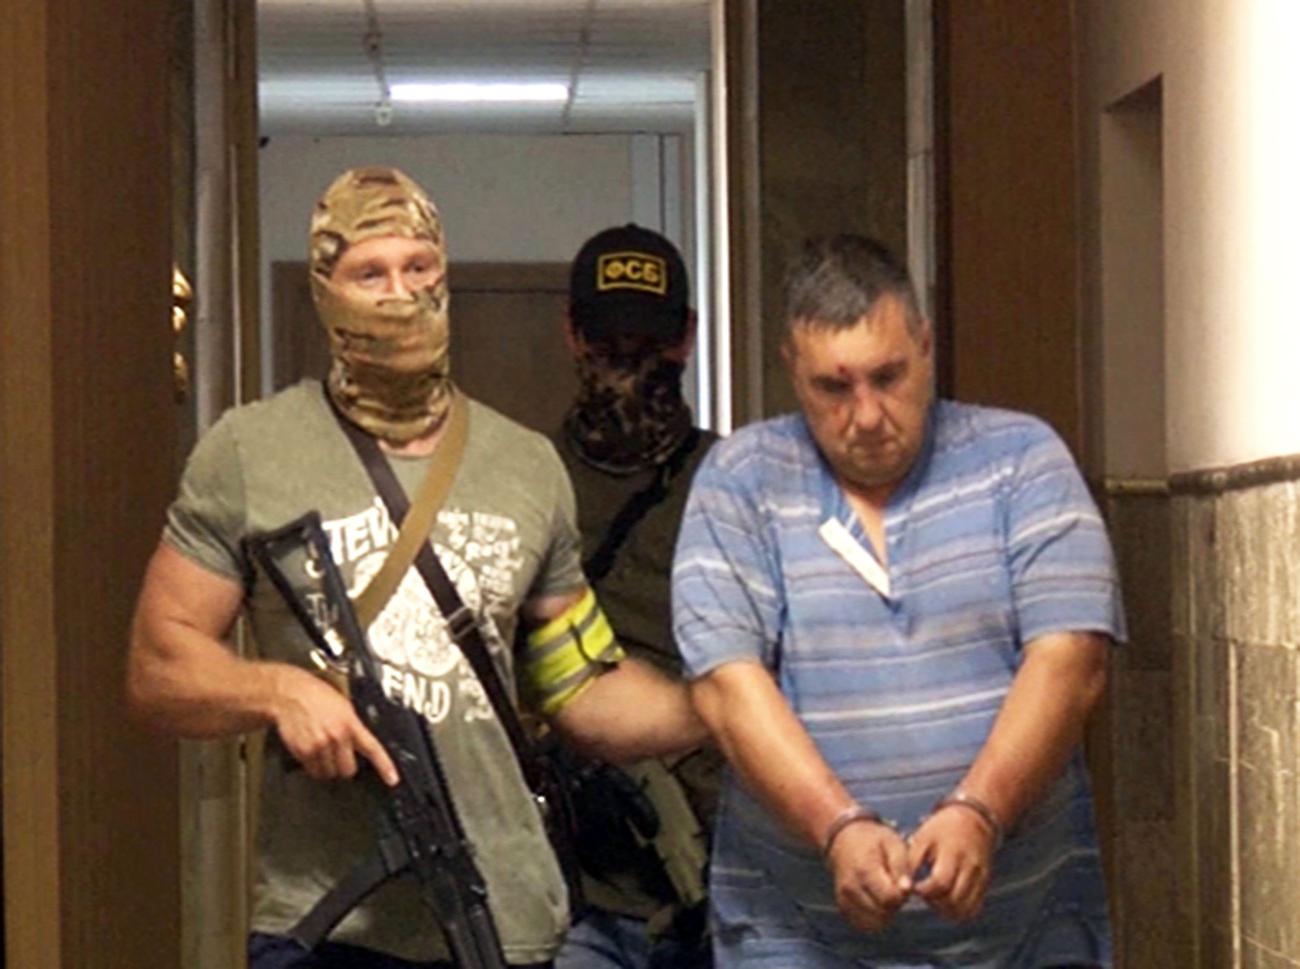 FSBはクリミアでウクライナの破壊工作員を拘束した=